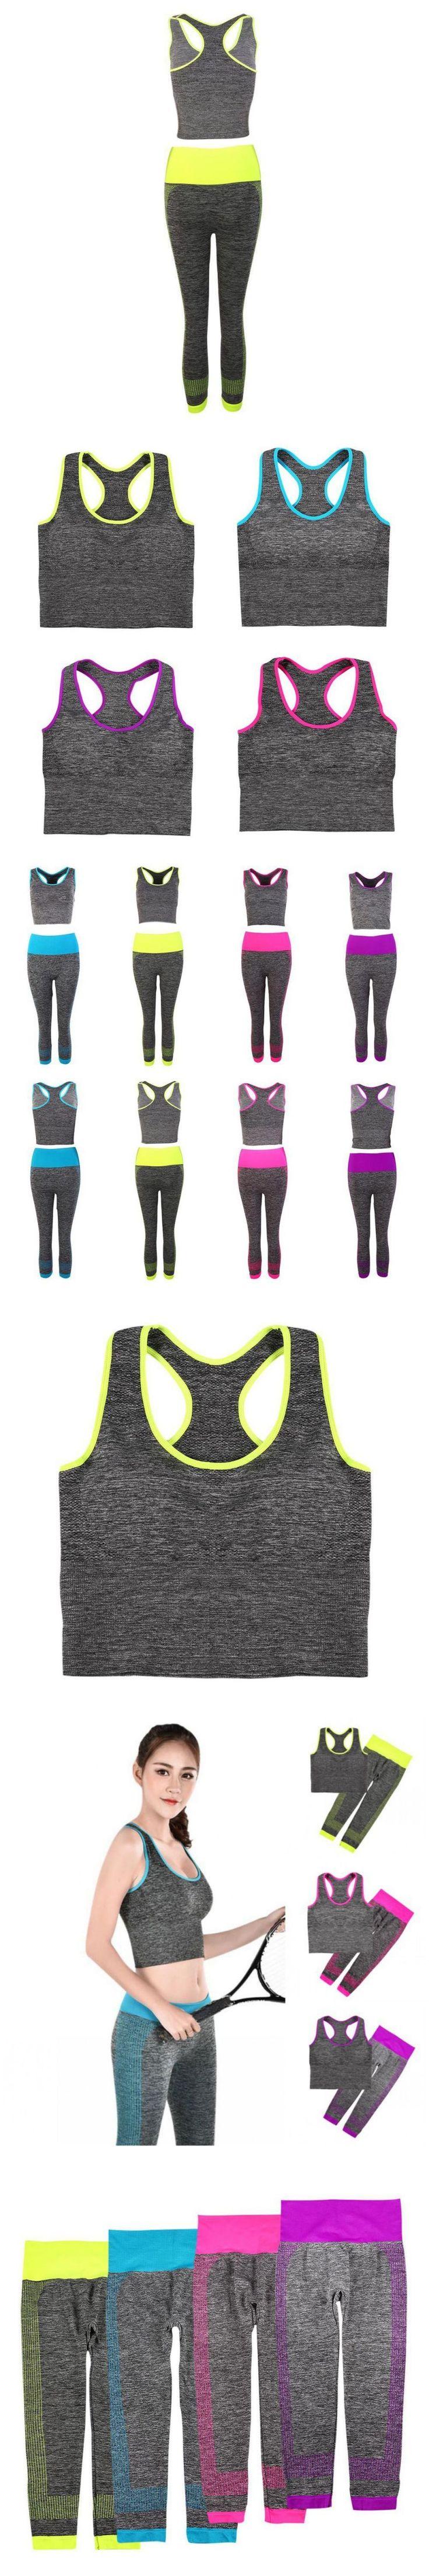 Liva girl Fashion New Corset  Pants Set Fitness Women's 2 Pieces Fitness Set Workout Bra Pants Leggings Set